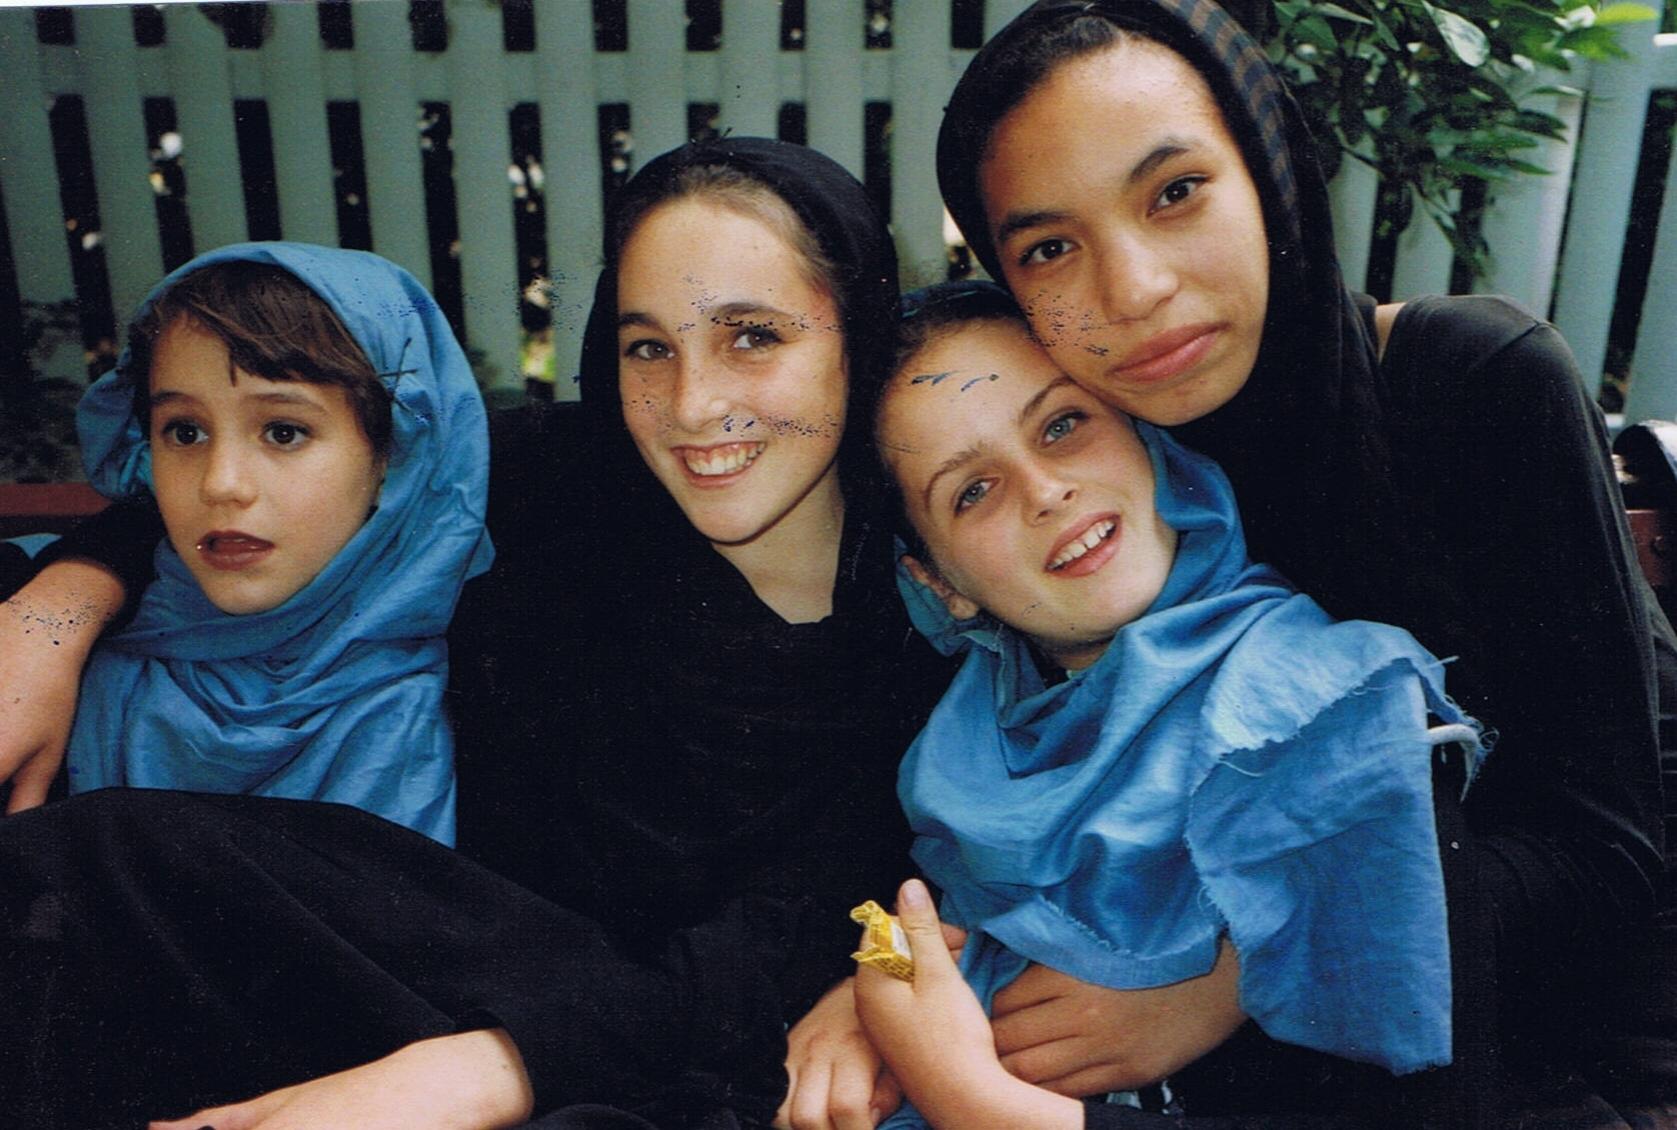 Moraya as Caravan Kid. Alumni Dancers (Left to right): Gabriela O'Shea, Isabel Cottingham, Eliza Alden, and Moraya Seeger.